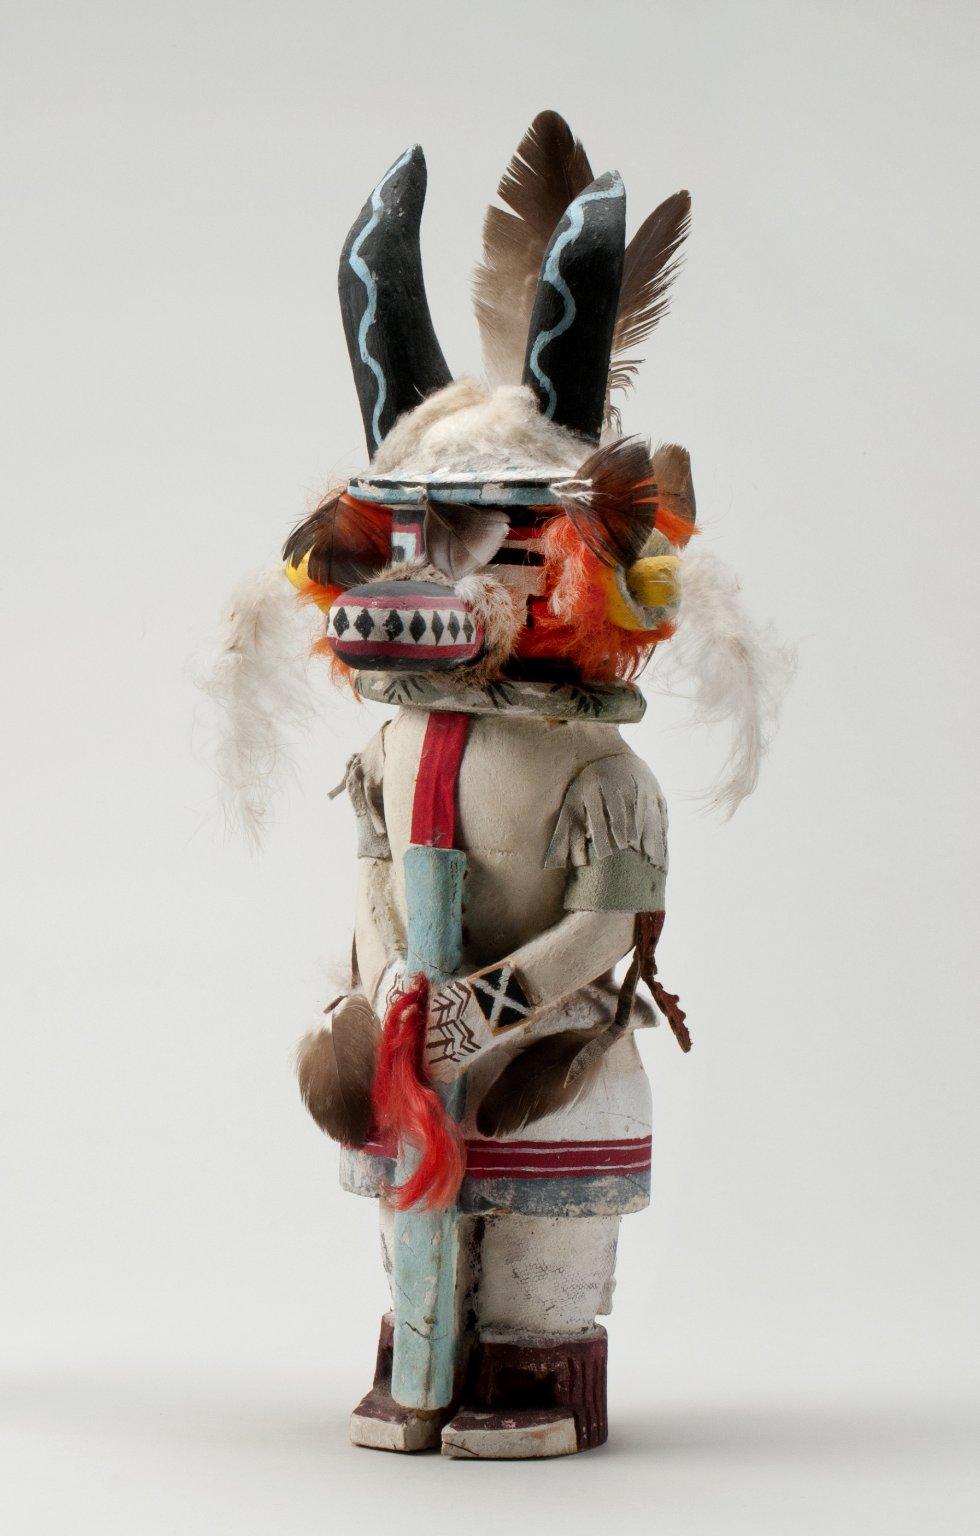 Pang Kachina Doll